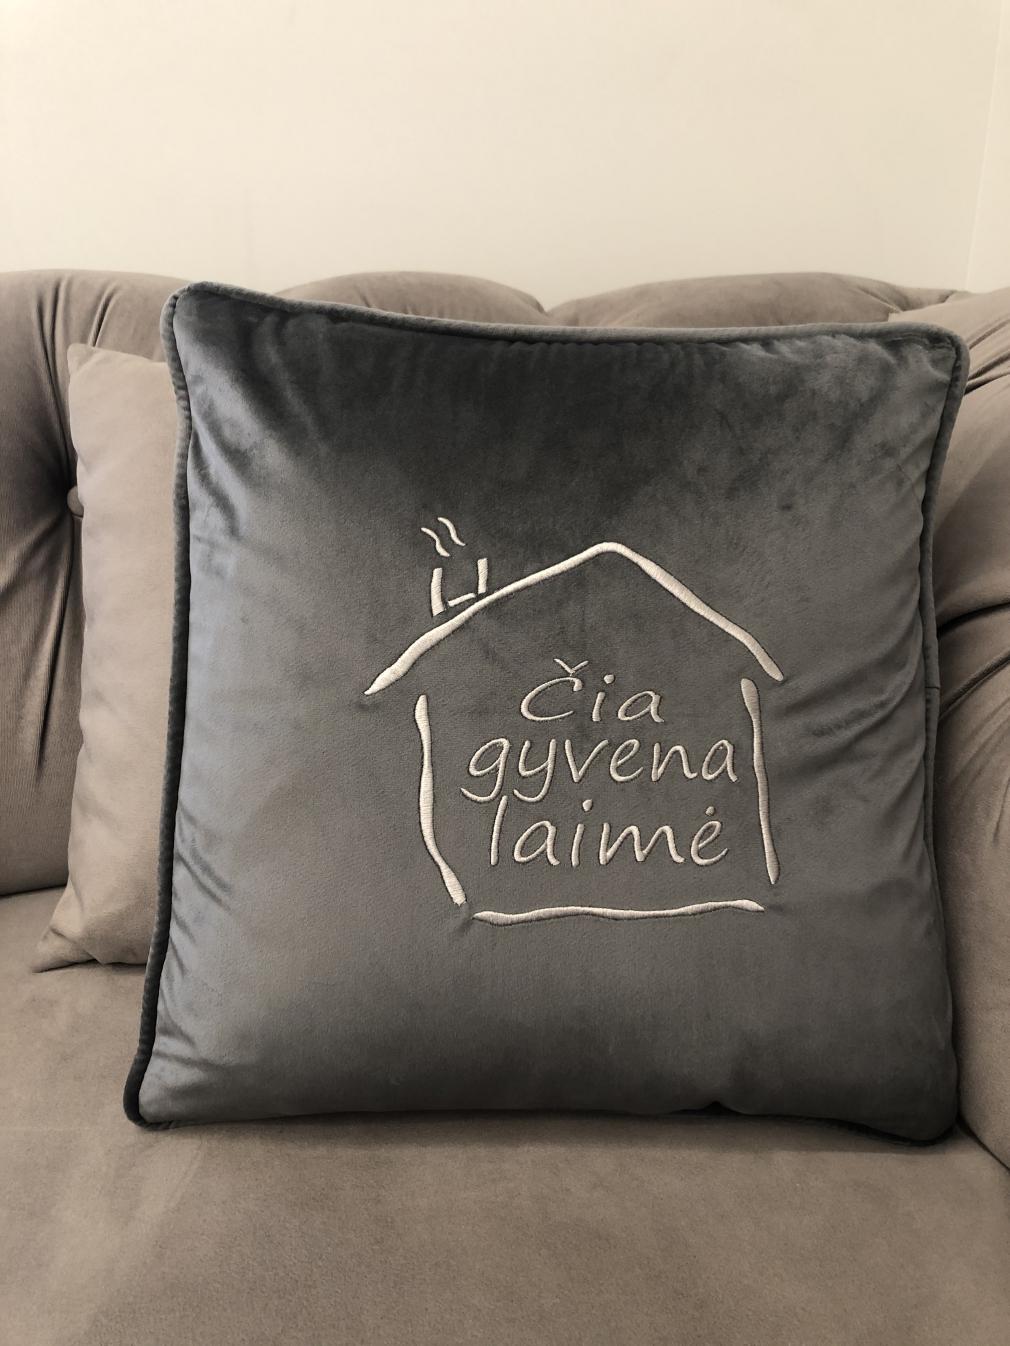 "Pilka aksomo pagalvėlė ""Čia gyvena laimė"""